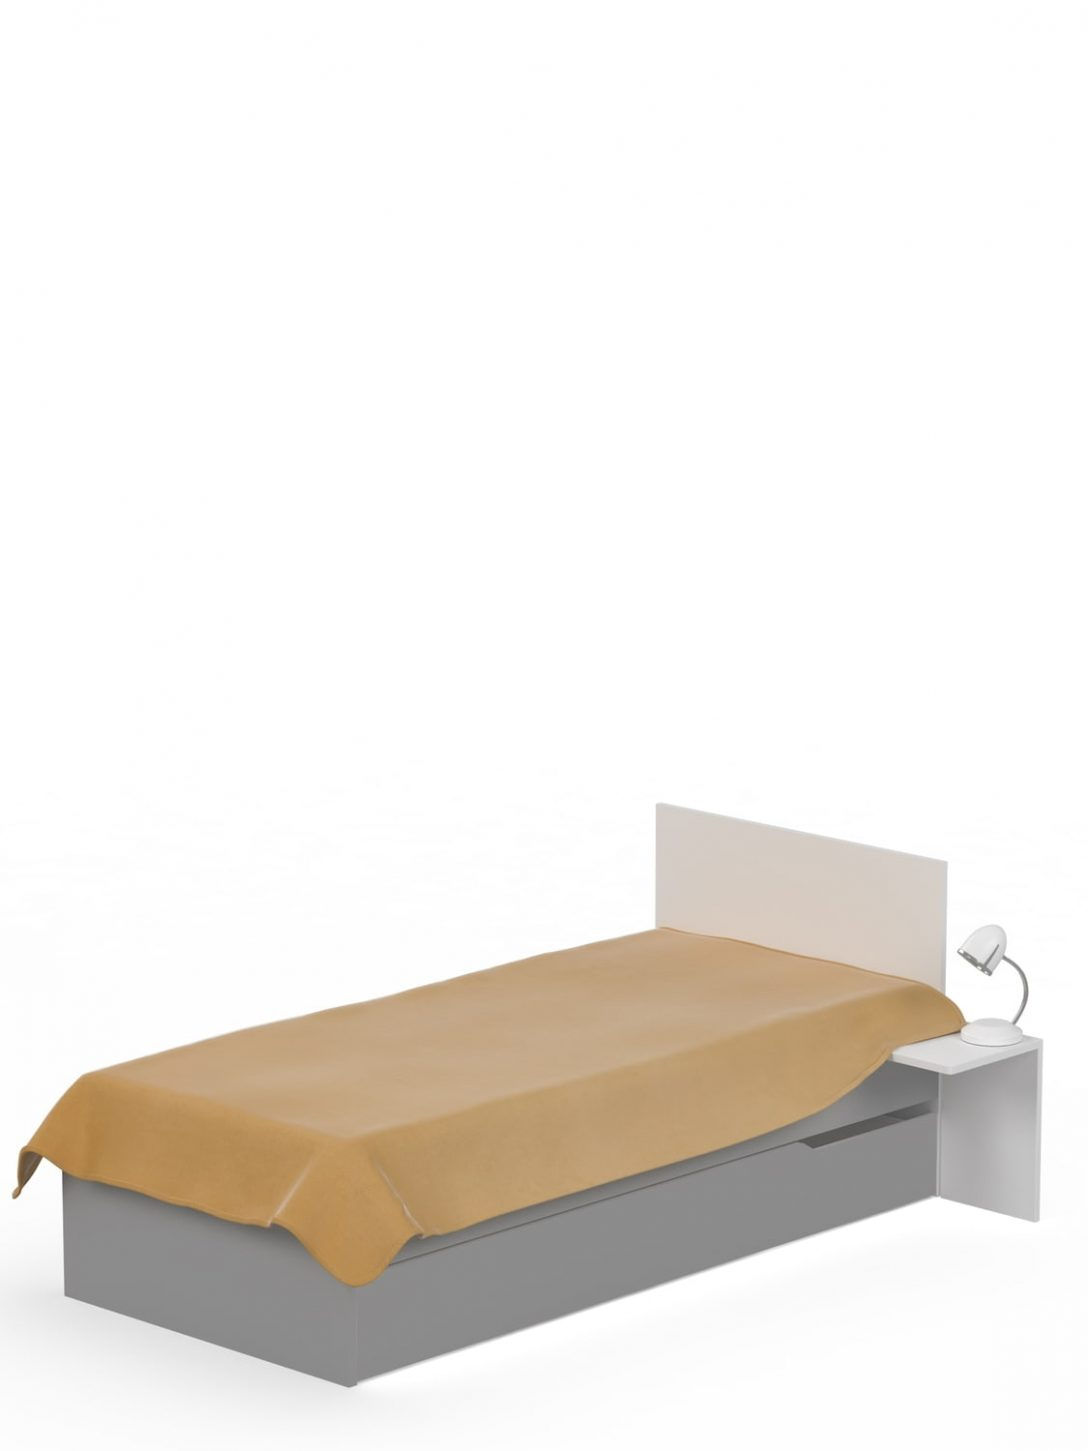 Large Size of Bett 120x190 Uni Grey Meblik Ebay Betten überlänge Schramm Clinique Even Better Foundation 200x220 Topper Wickelbrett Für Stabiles Ruf Fabrikverkauf 180x200 Bett Bett 120x190